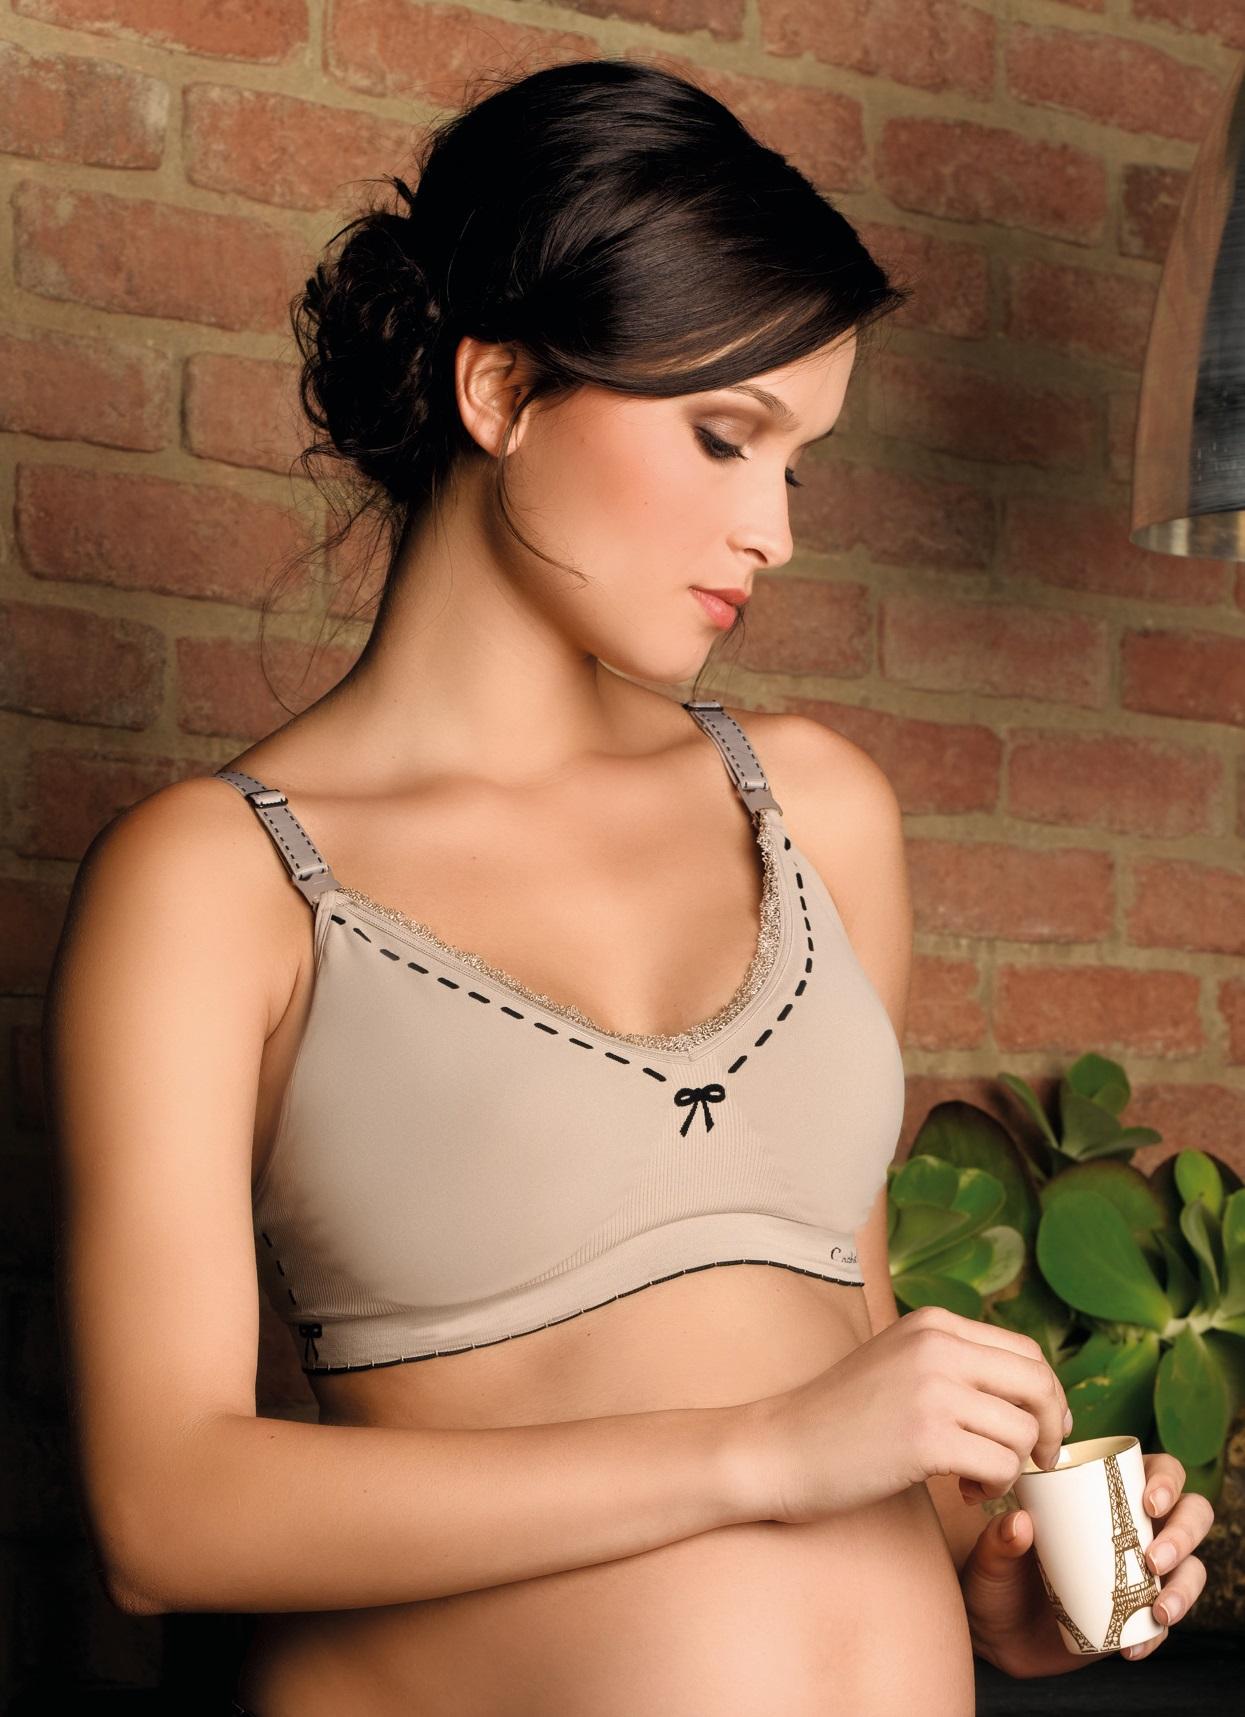 cache-coeur-illusion-nursing-bra-nude-4.jpg